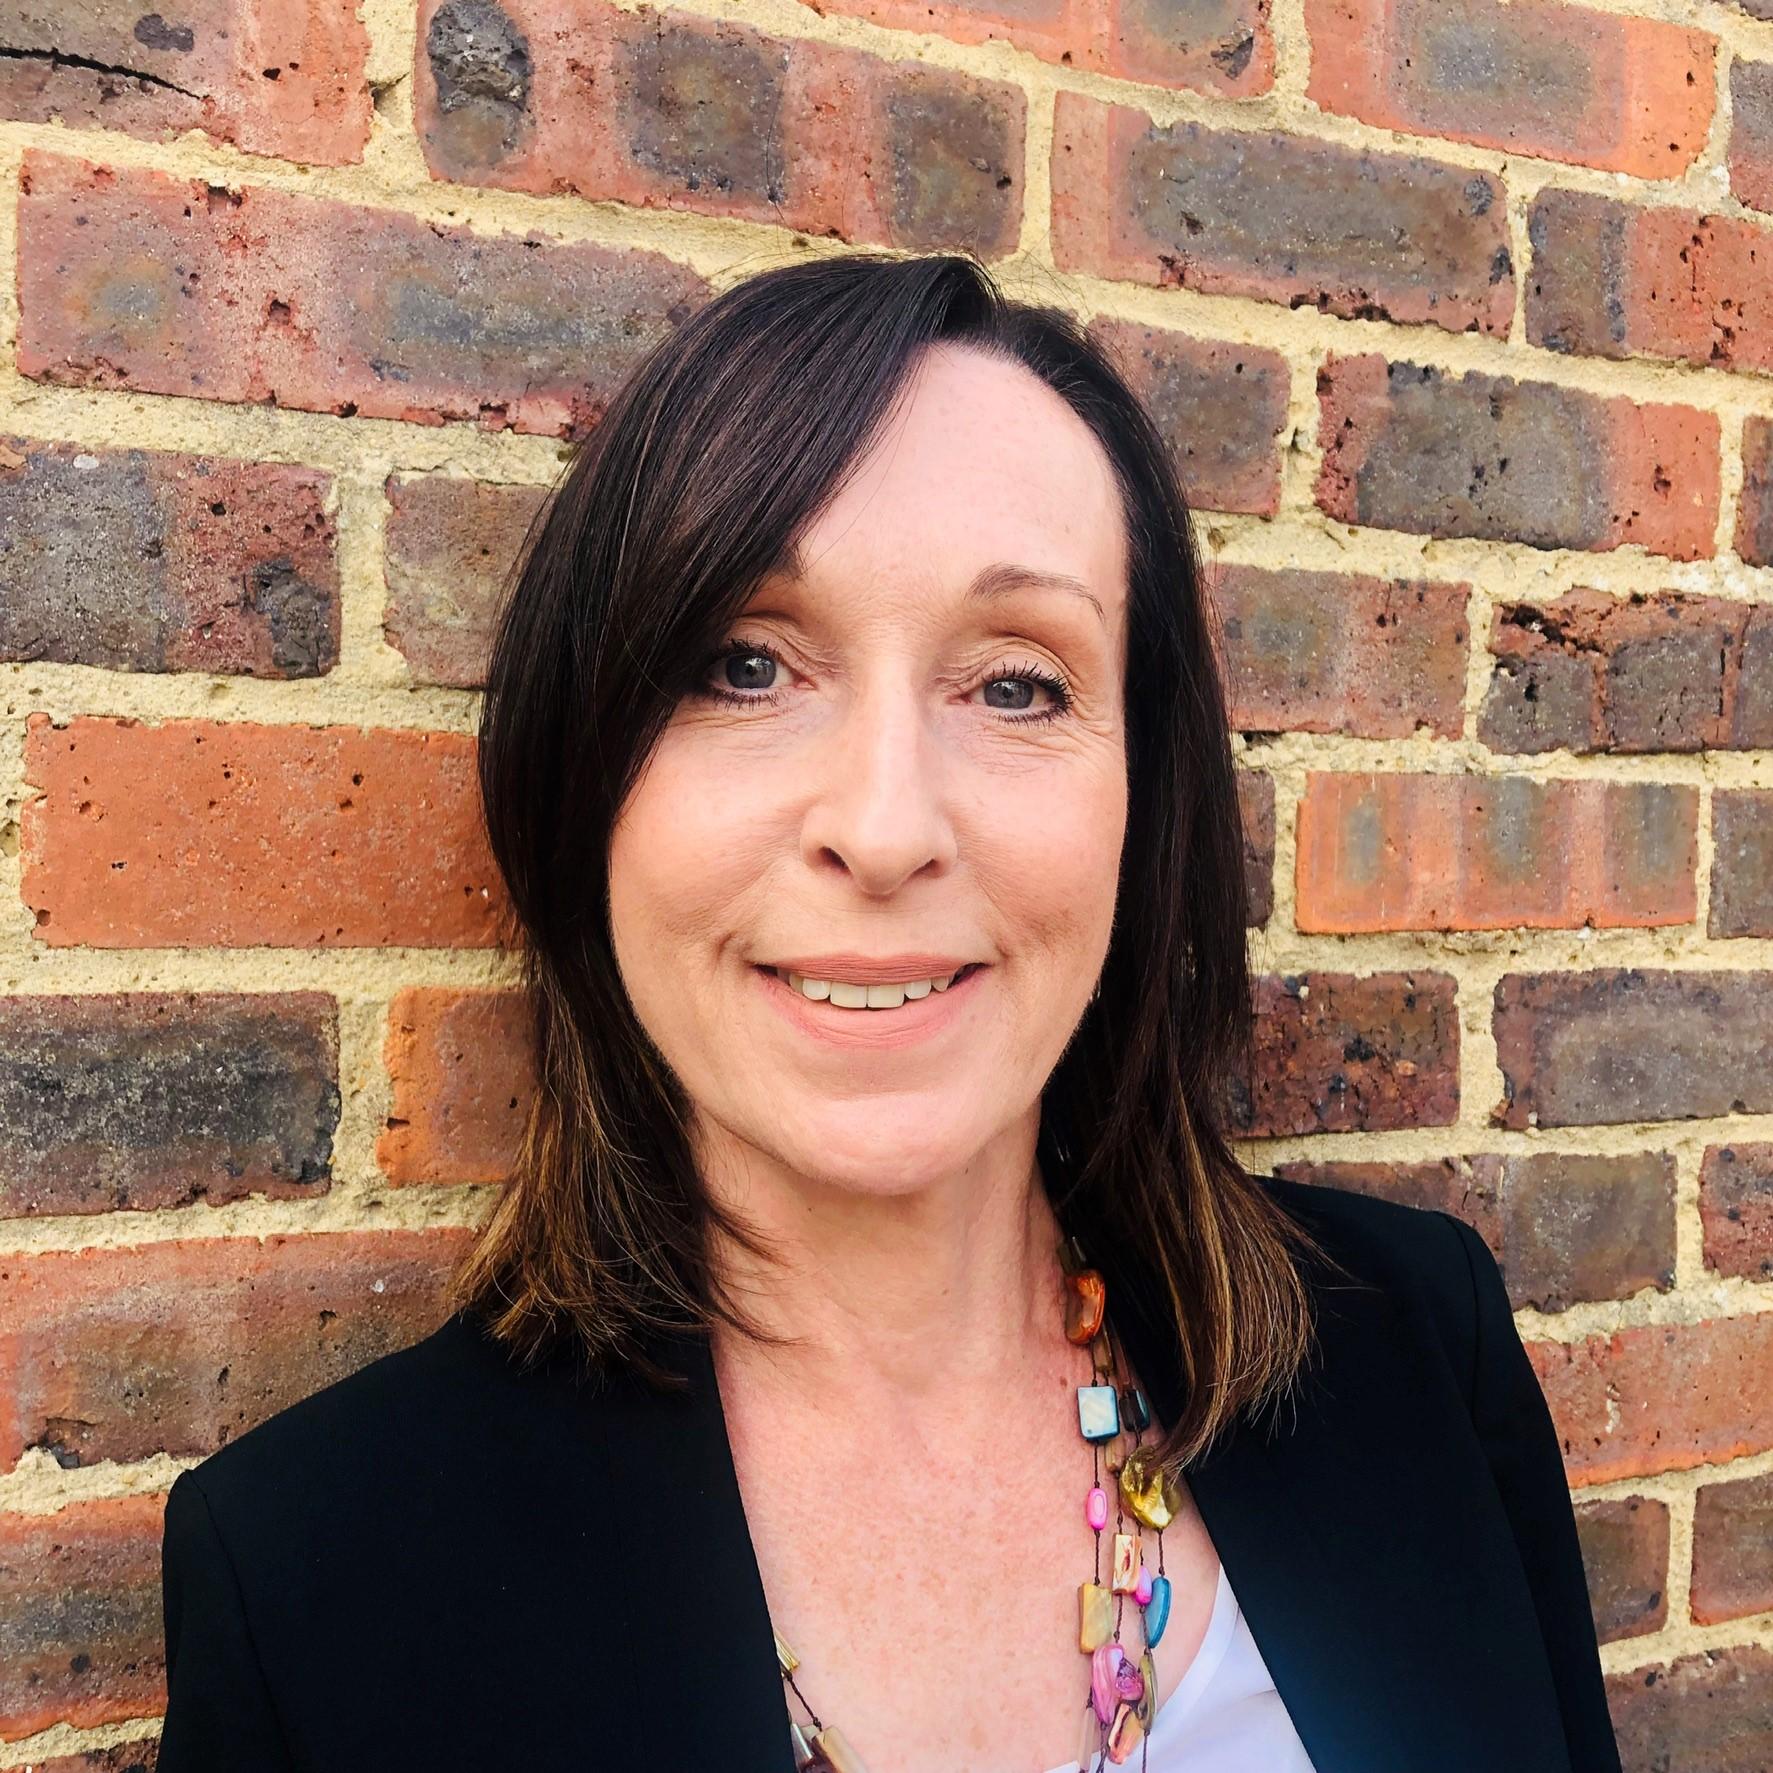 Samantha Walton